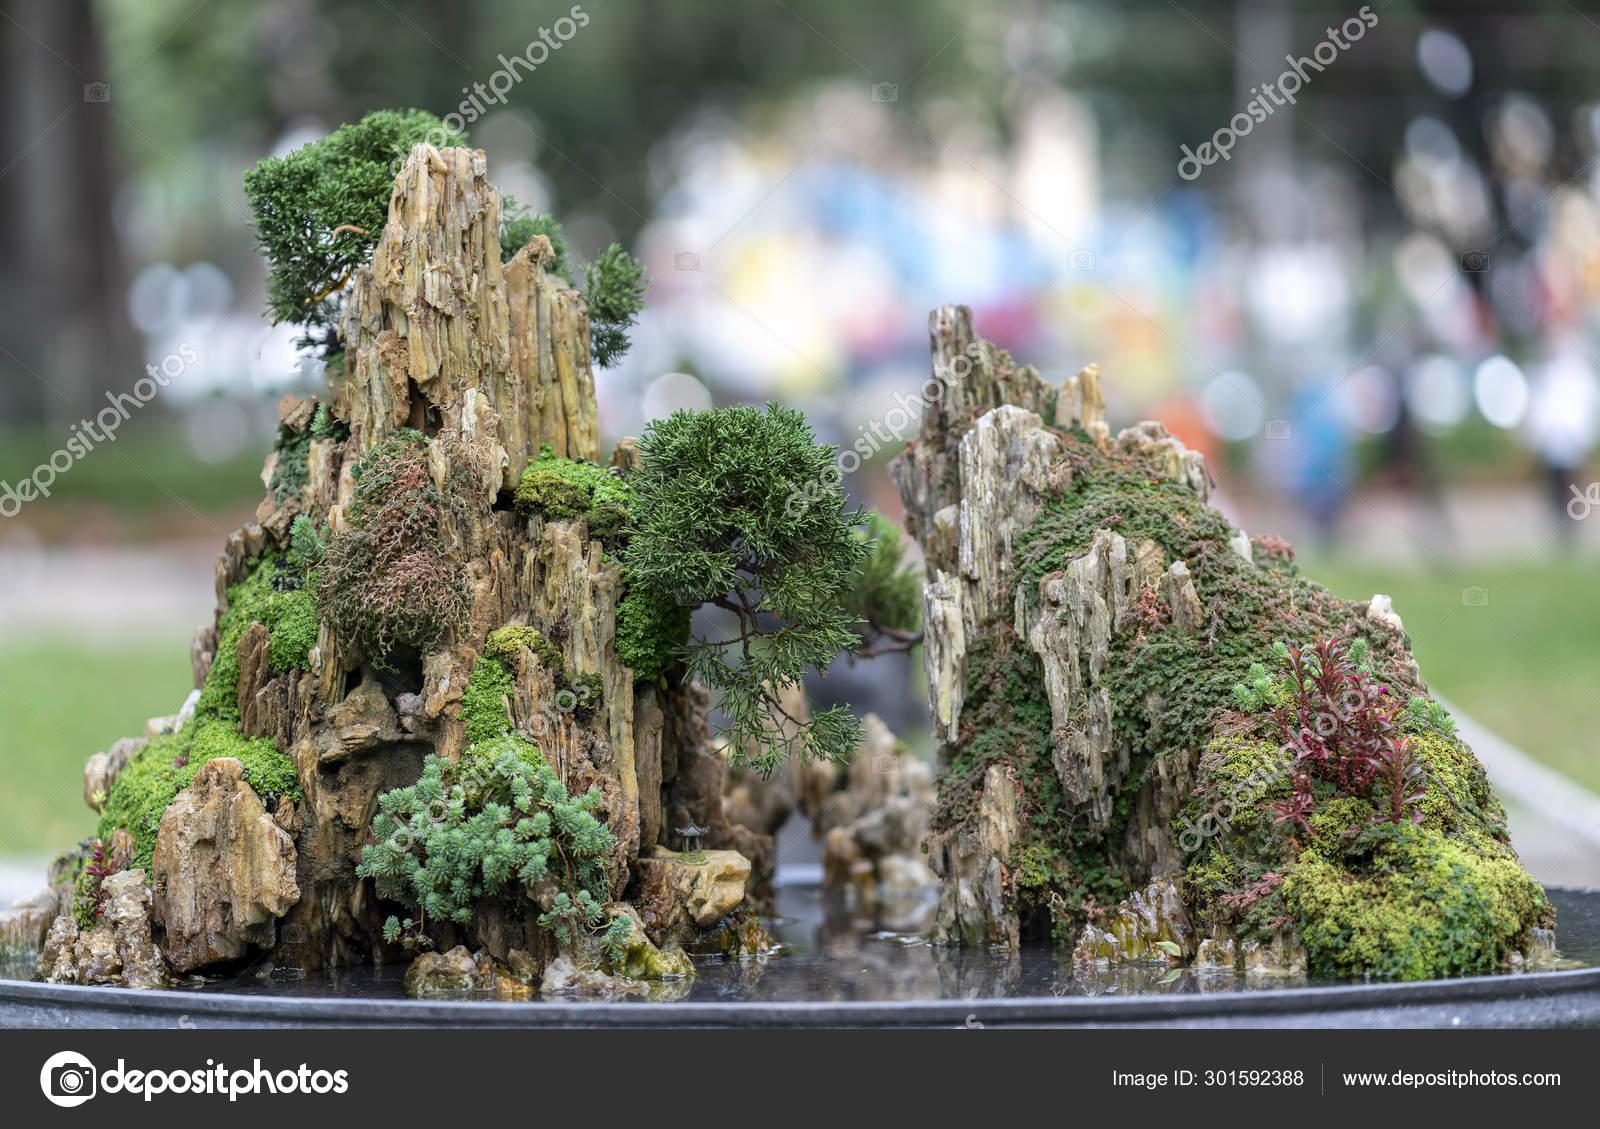 Bonsai Penjing Miniature Tray Say Human Life Must Strong Rise Stock Photo C Huythoai1978 Gmail Com 301592388